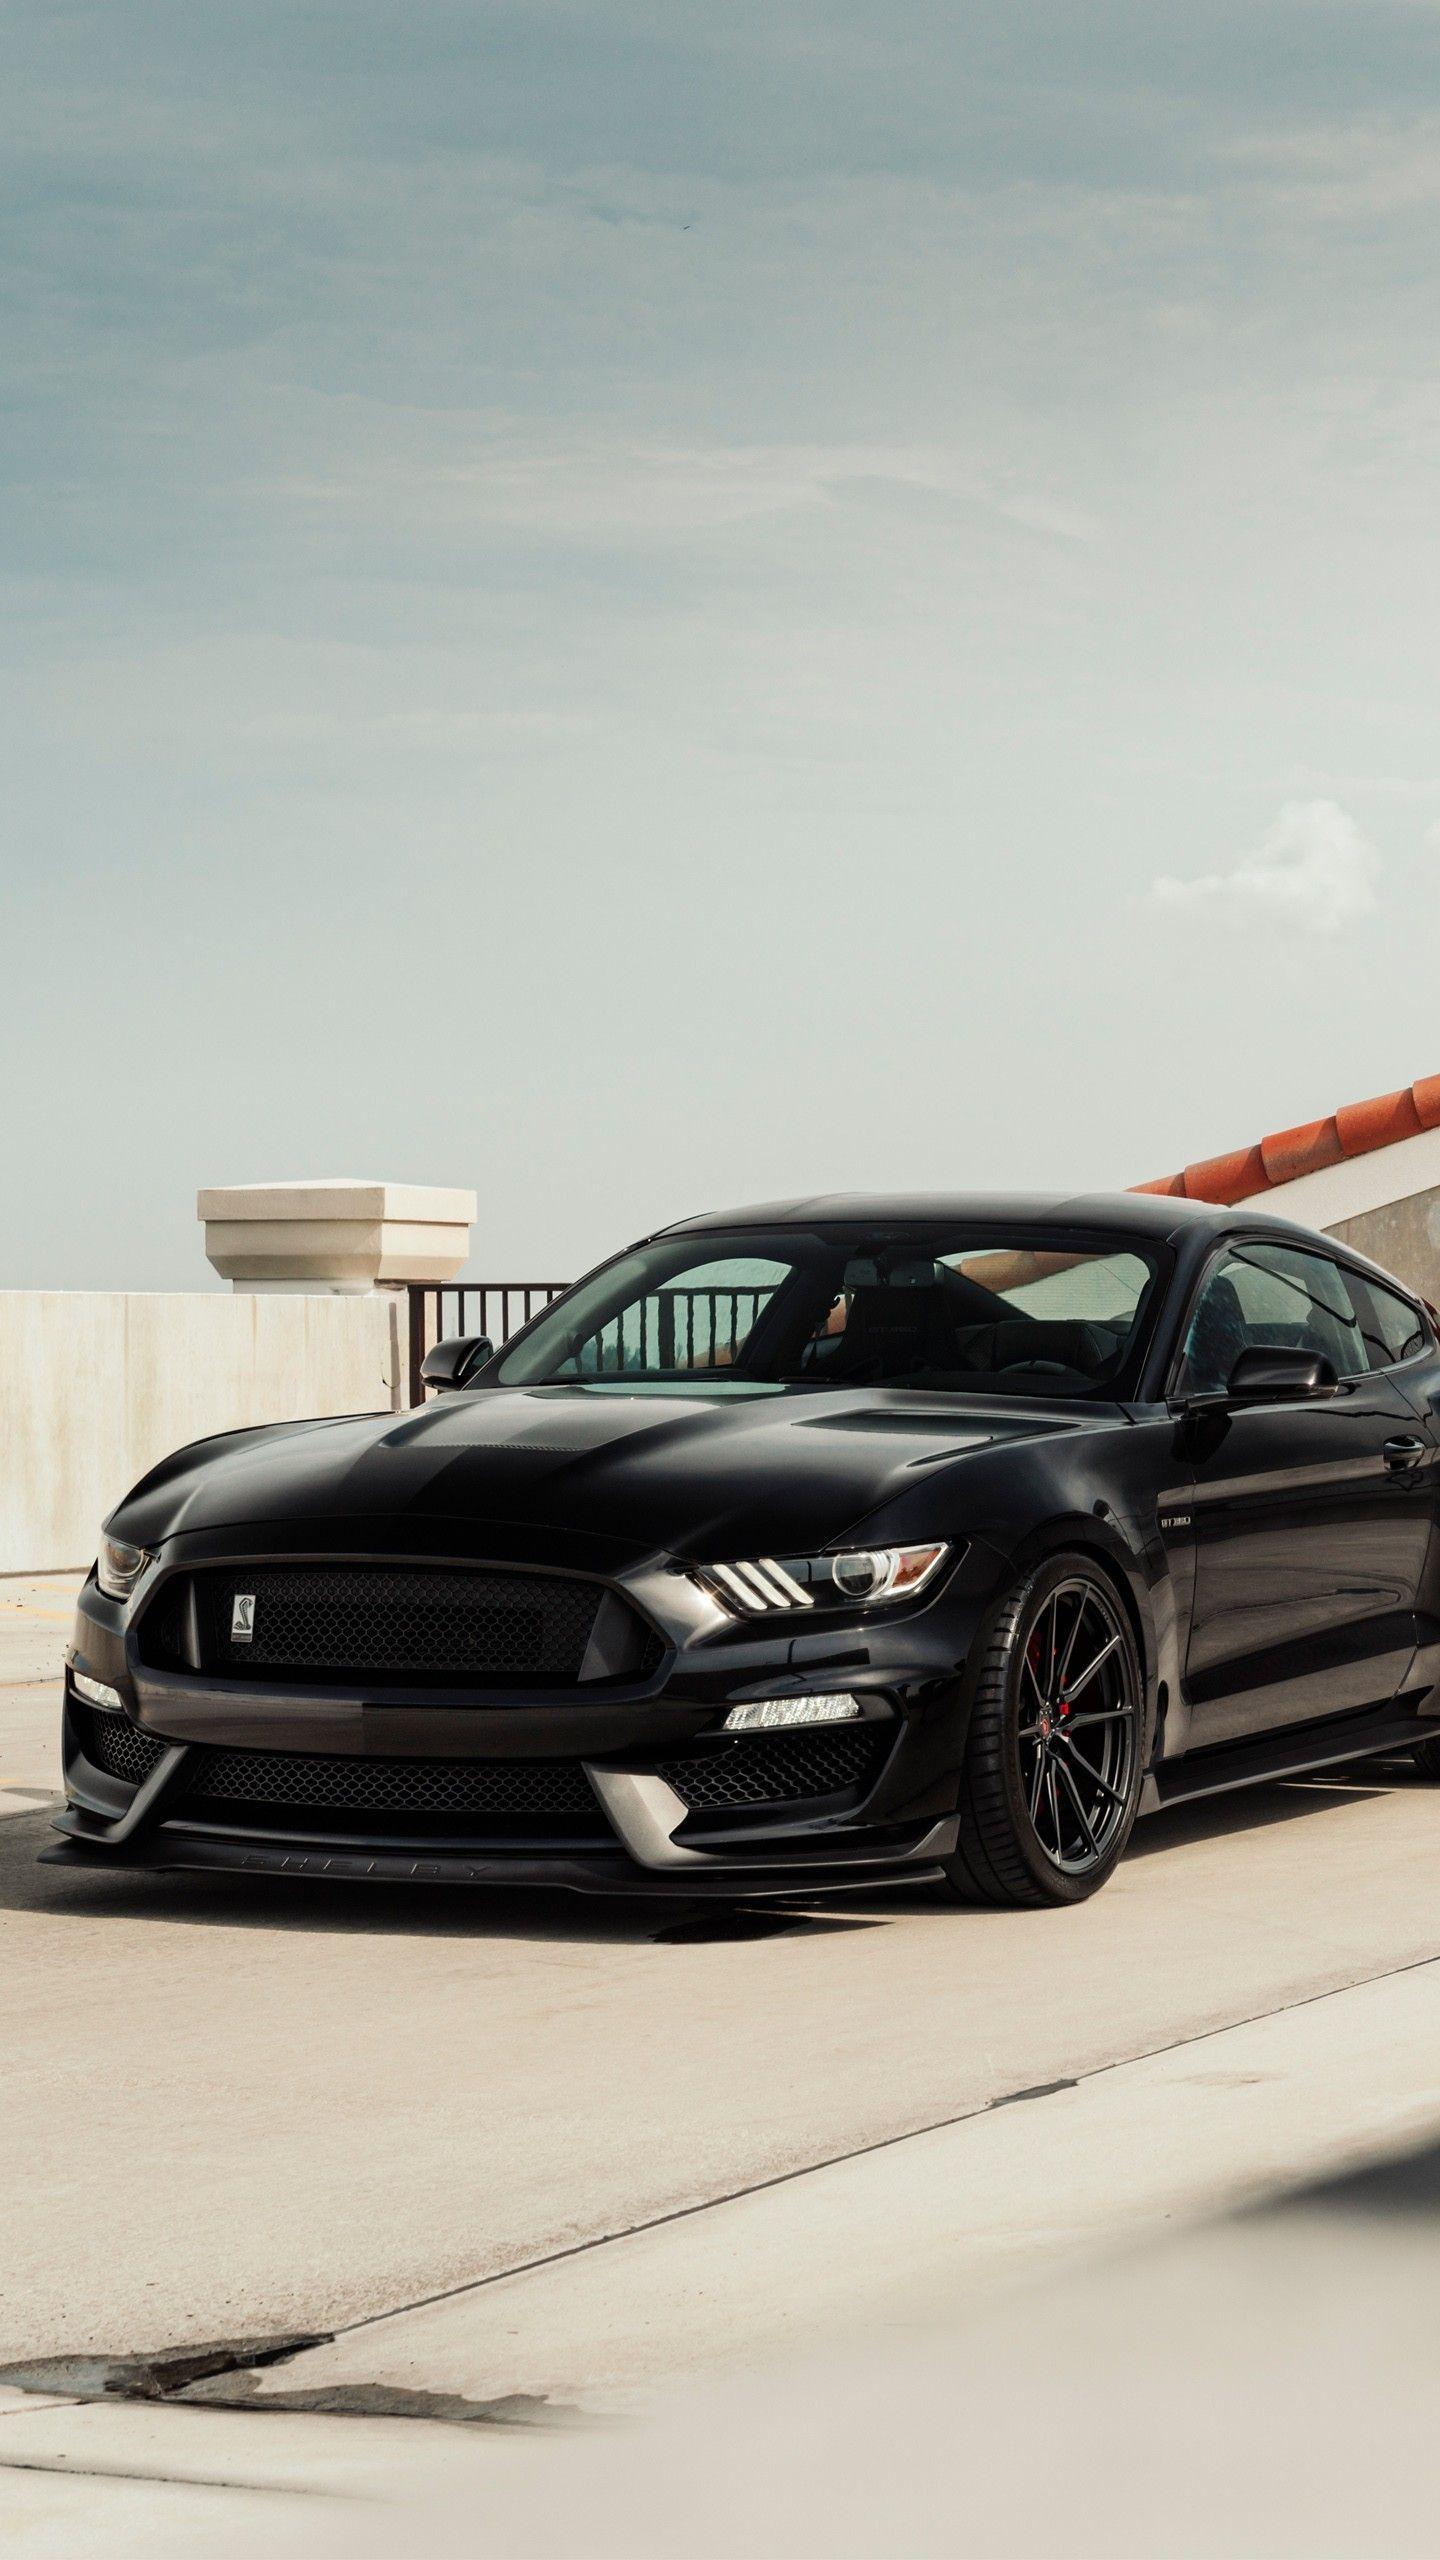 Full Hd Mustang Iphone Wallpaper ipcwallpapers in 2020 Mustang 1440x2560